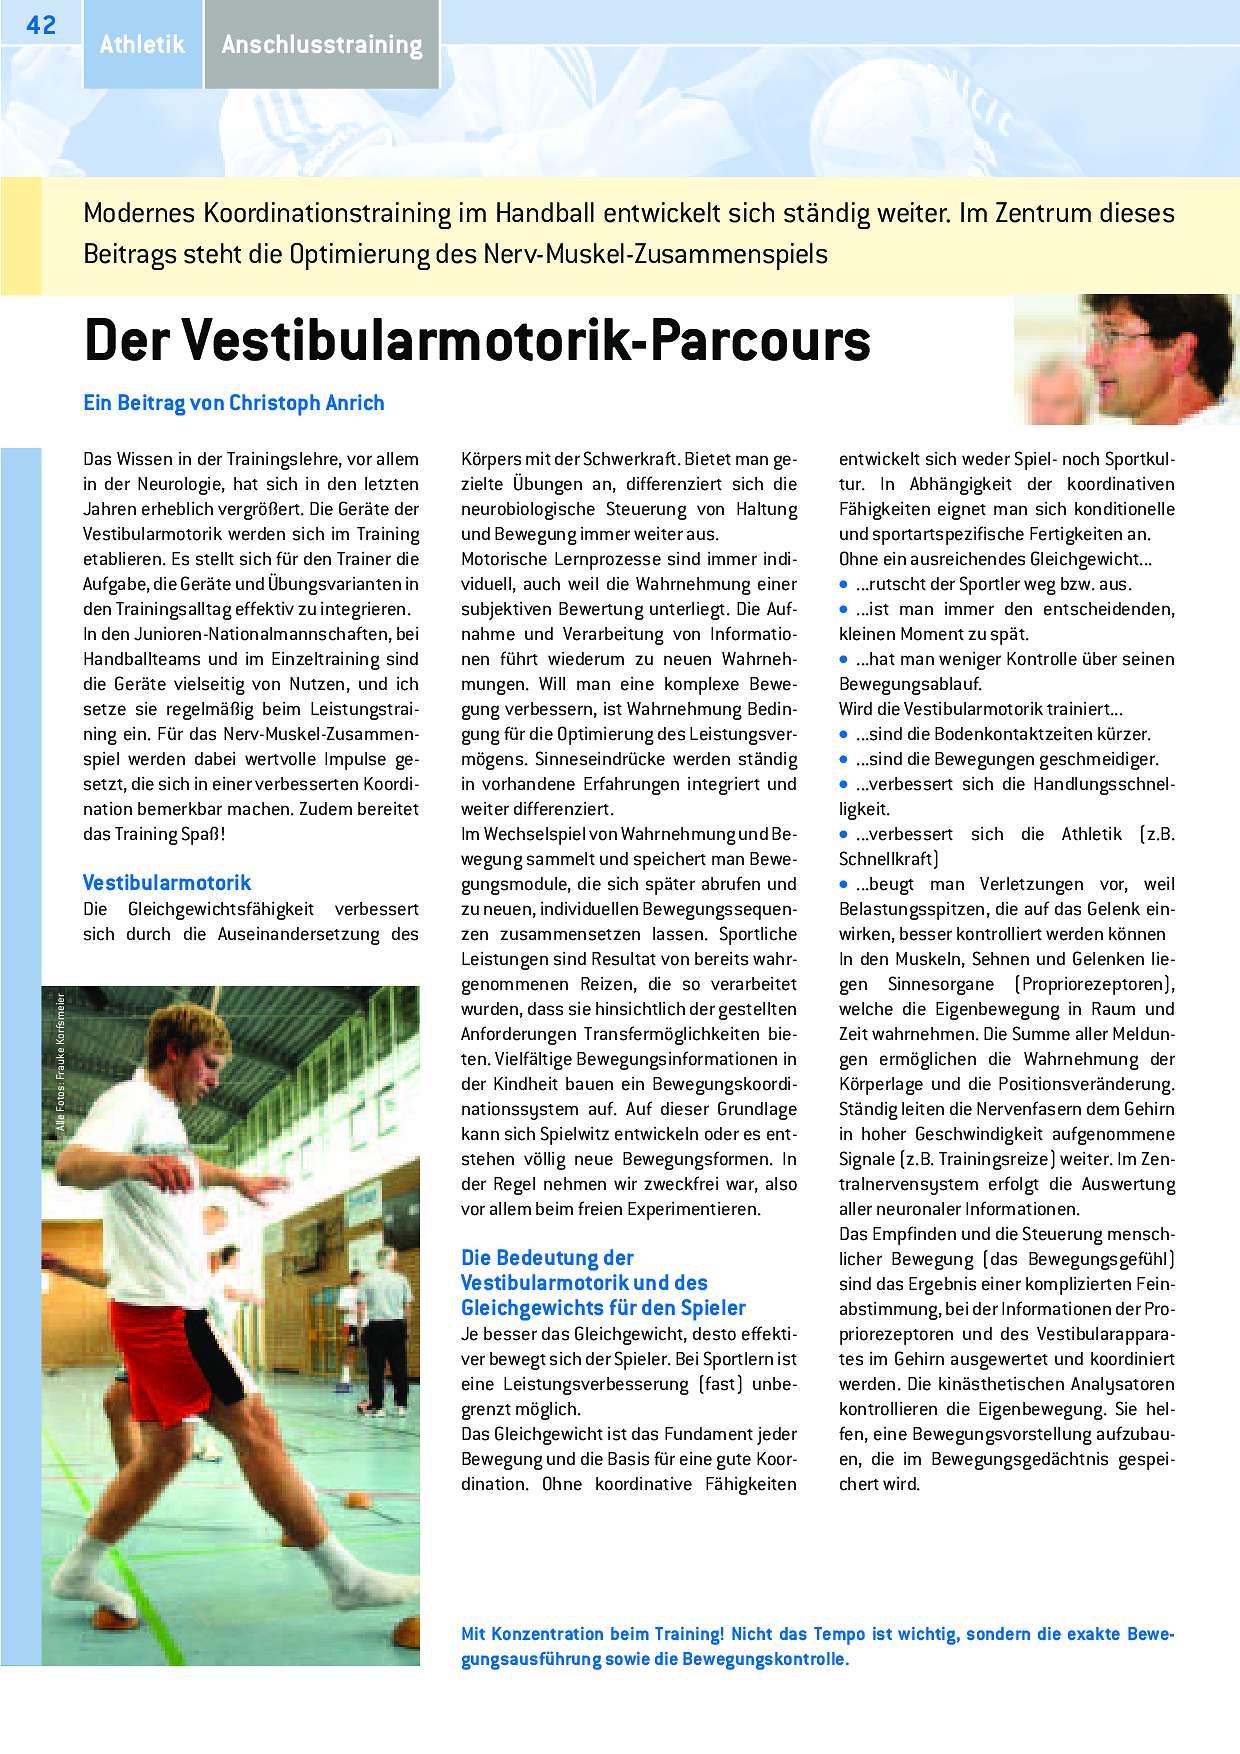 Der Vestibularmotorik-Parcours